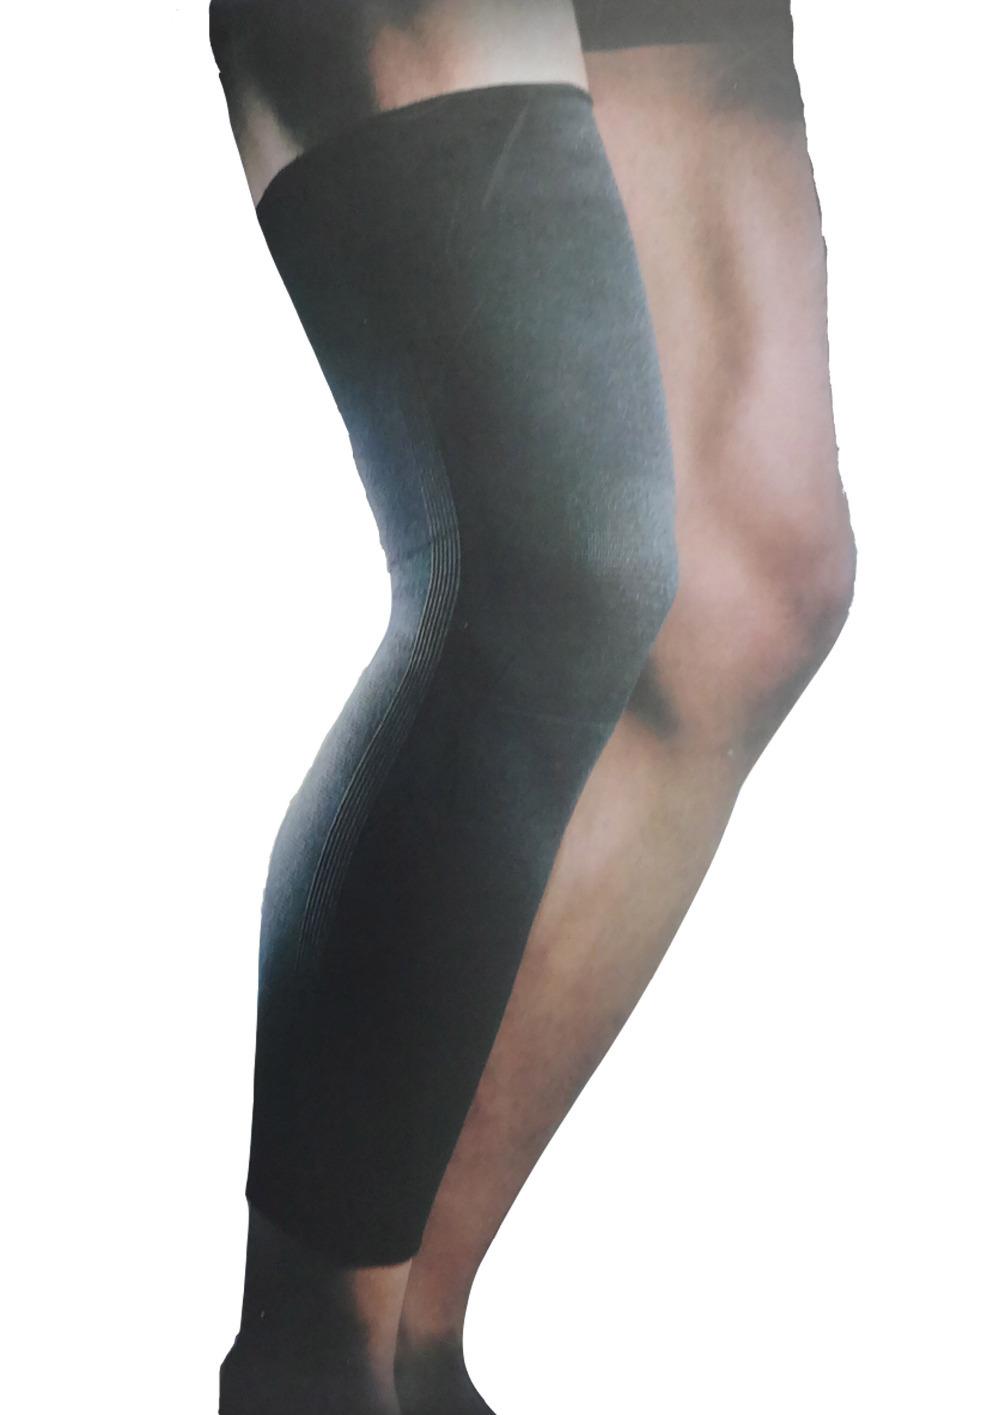 Black elastic nylon spandex cotton knee brace thigh shin support free shipping #sb210(China (Mainland))